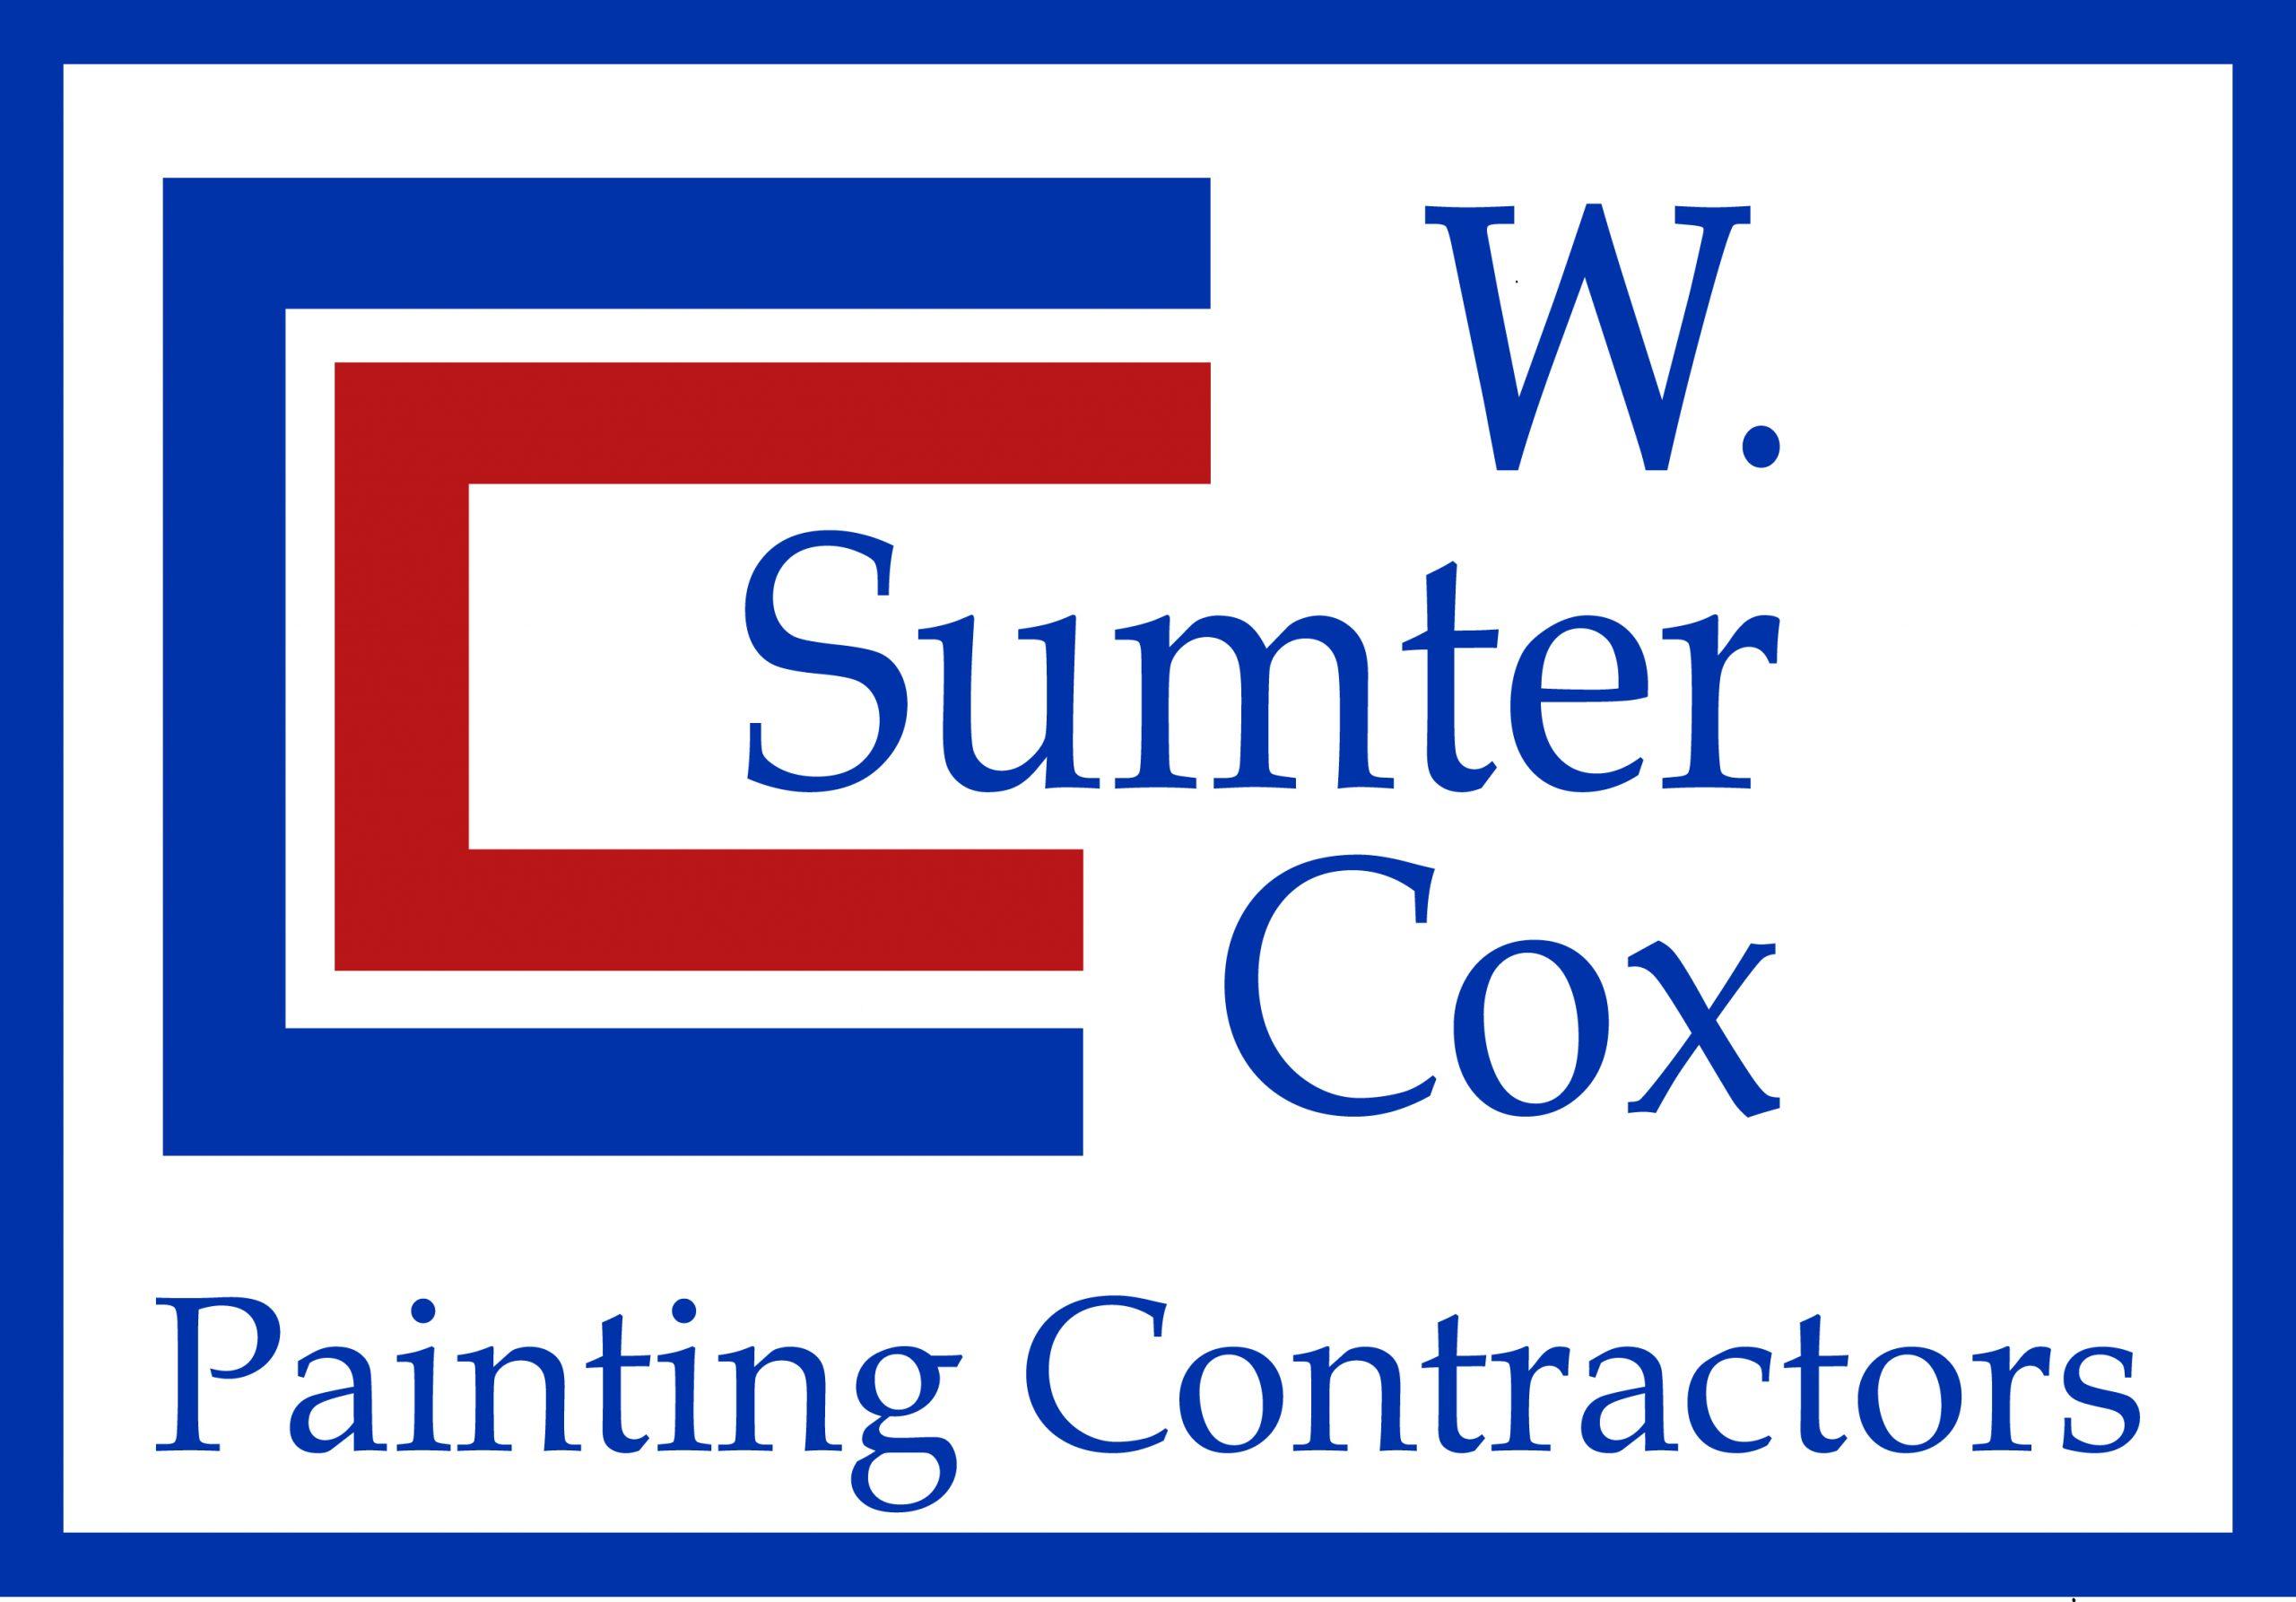 W. Sumter Cox Painting Contractors, Inc.